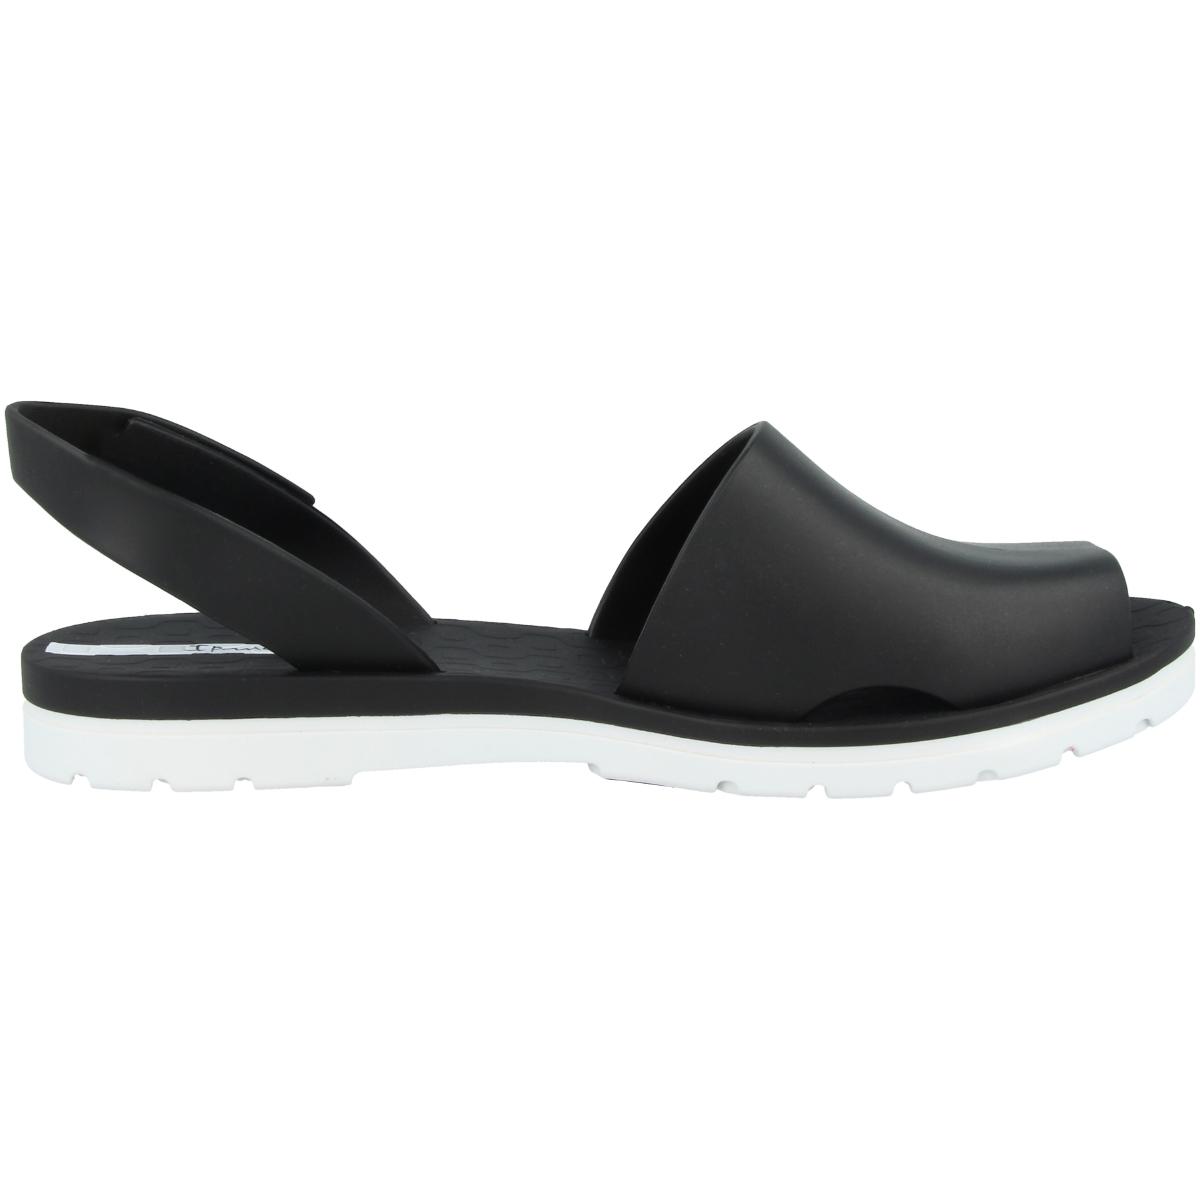 Ipanema Barcelone Fem Chaussures Women Femmes Sandales Sandales Pantoufles 26415-8047